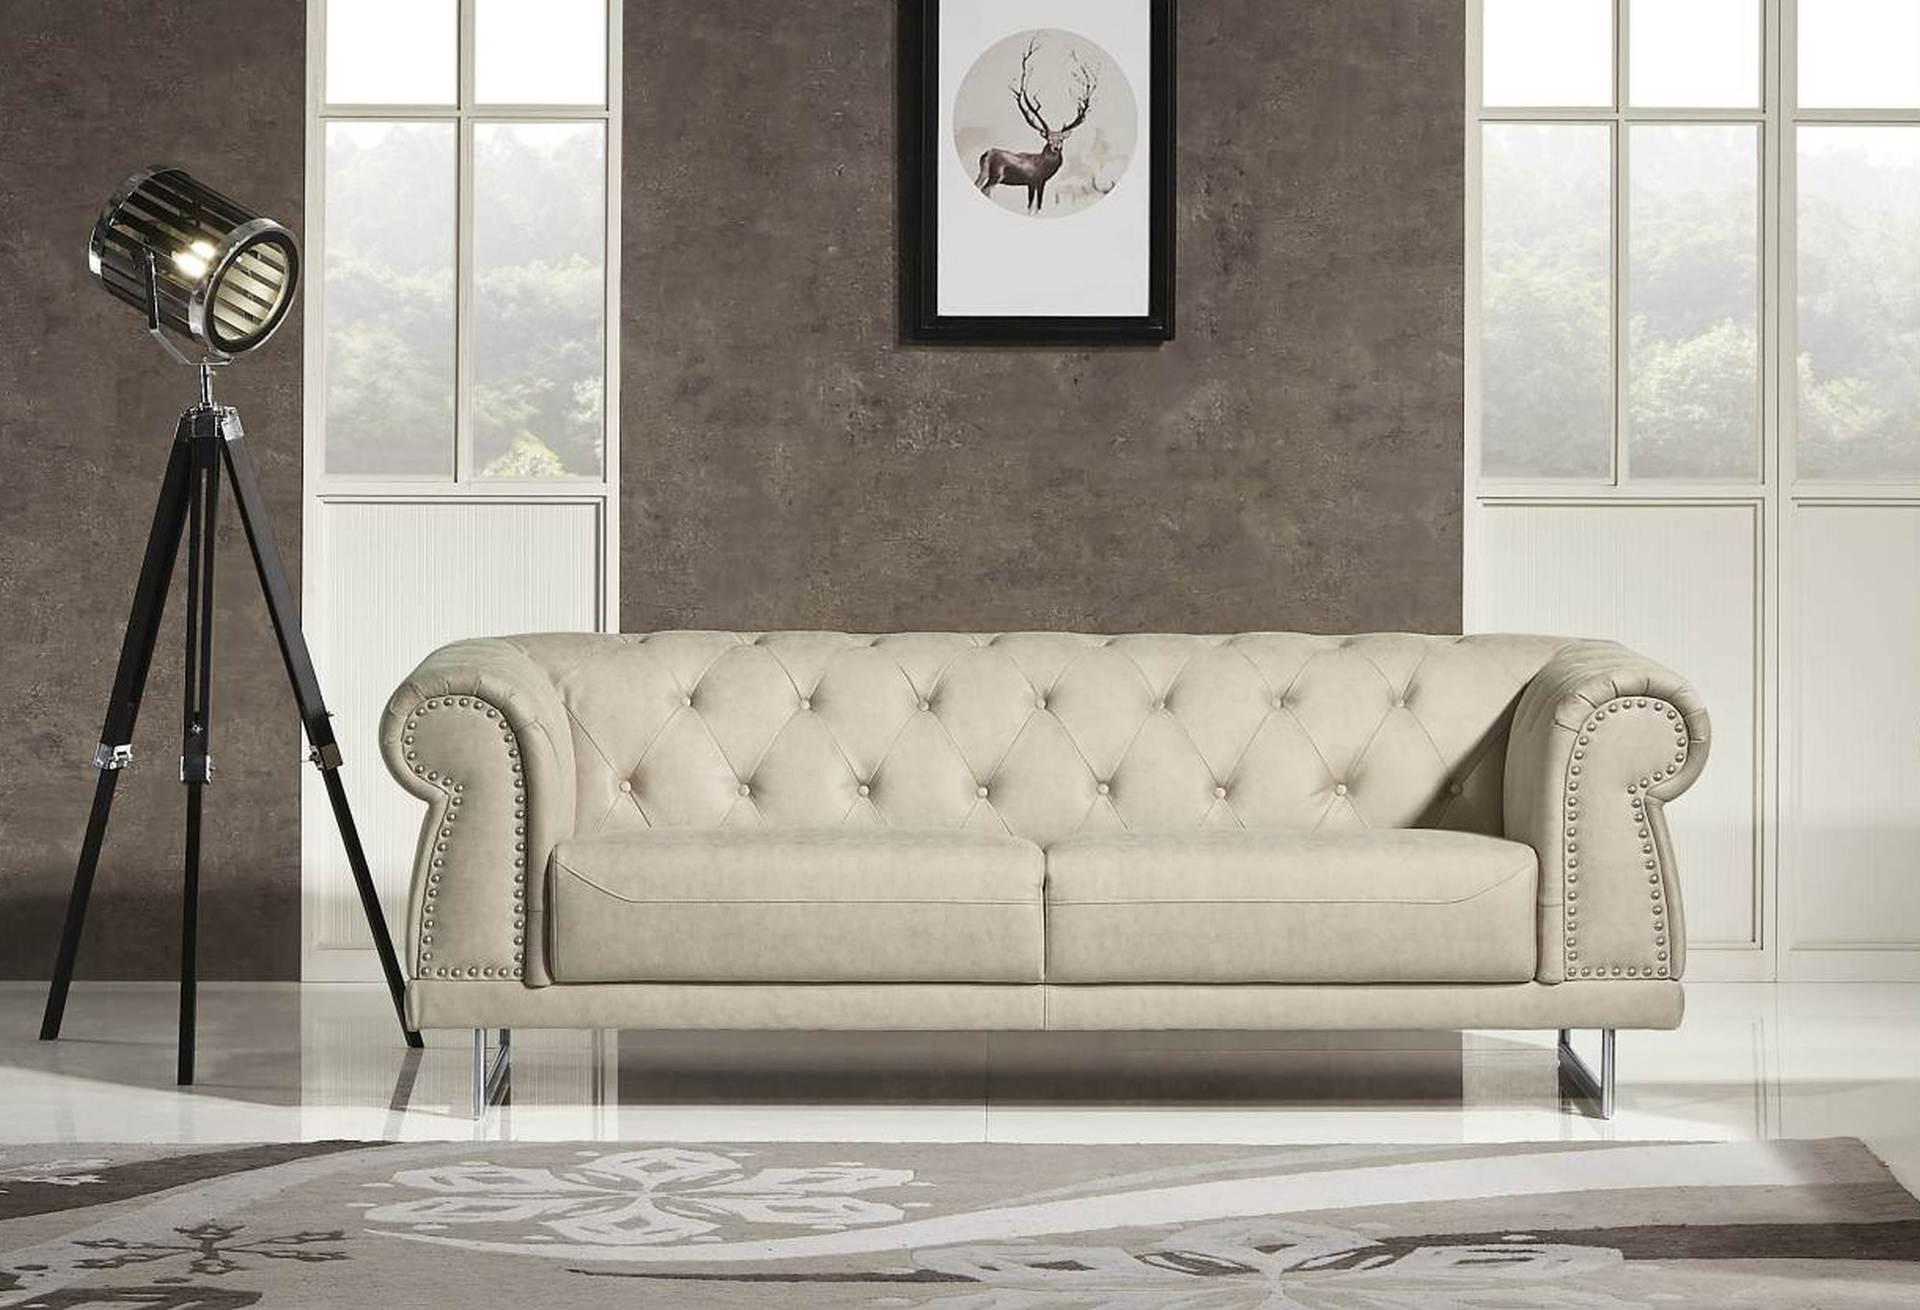 Mason Designer Sofa Leather Air Code G01 Beige Husky